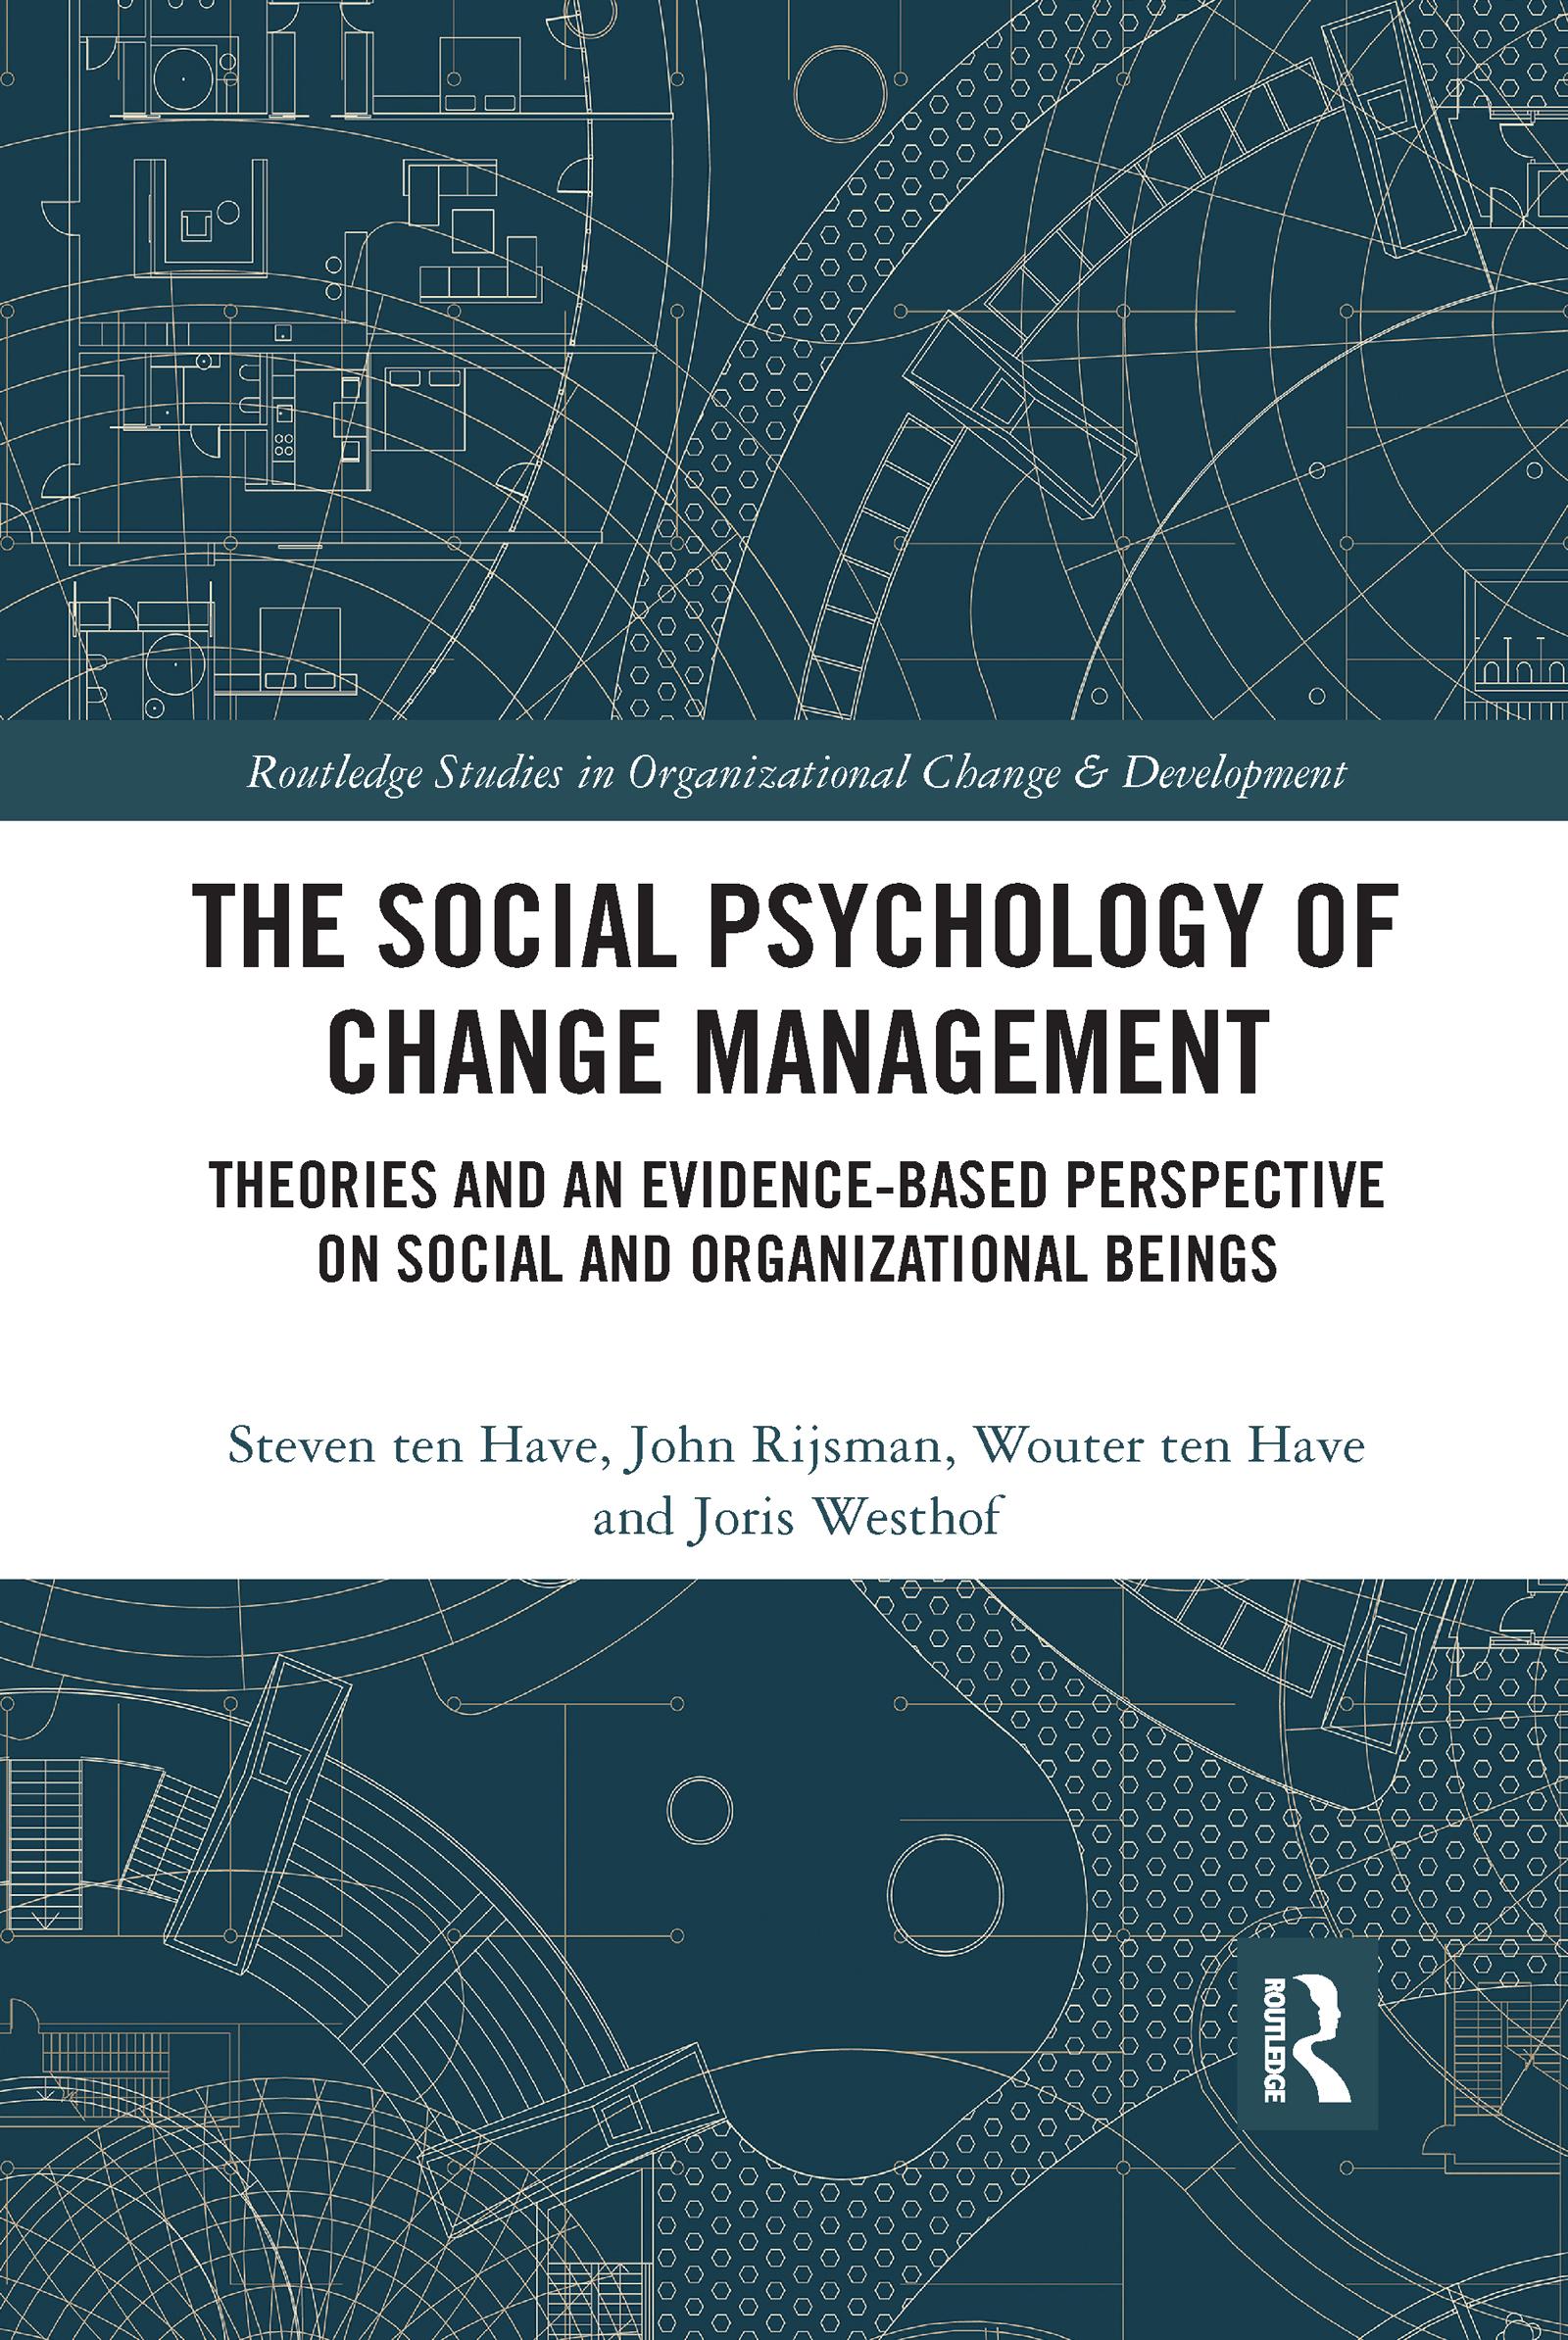 The Social Psychology of Change Management